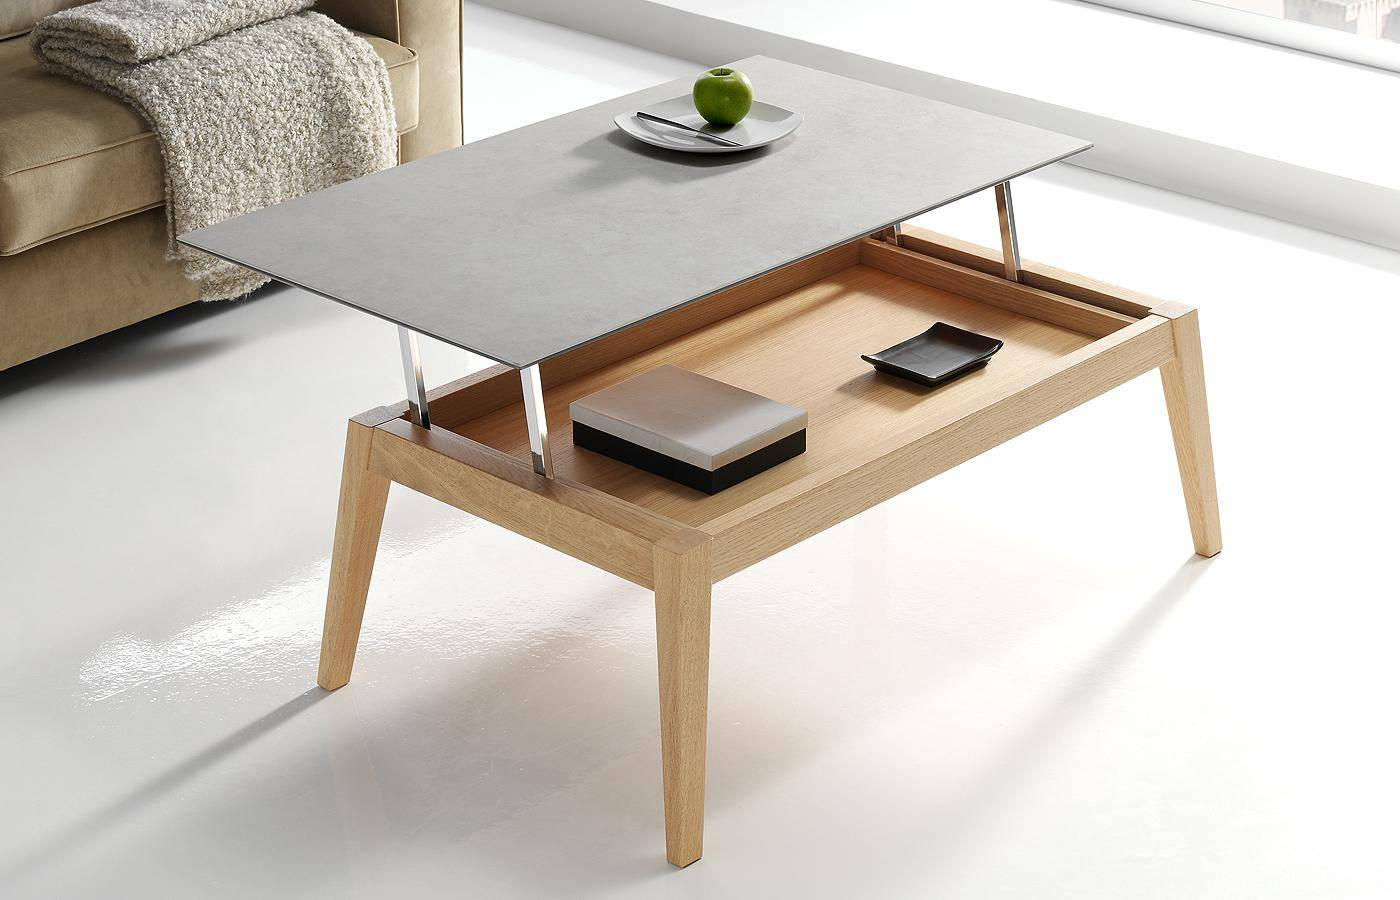 Mesa de centro elevable oko porcel nico dismobel - Mesas de centro elevables merkamueble ...